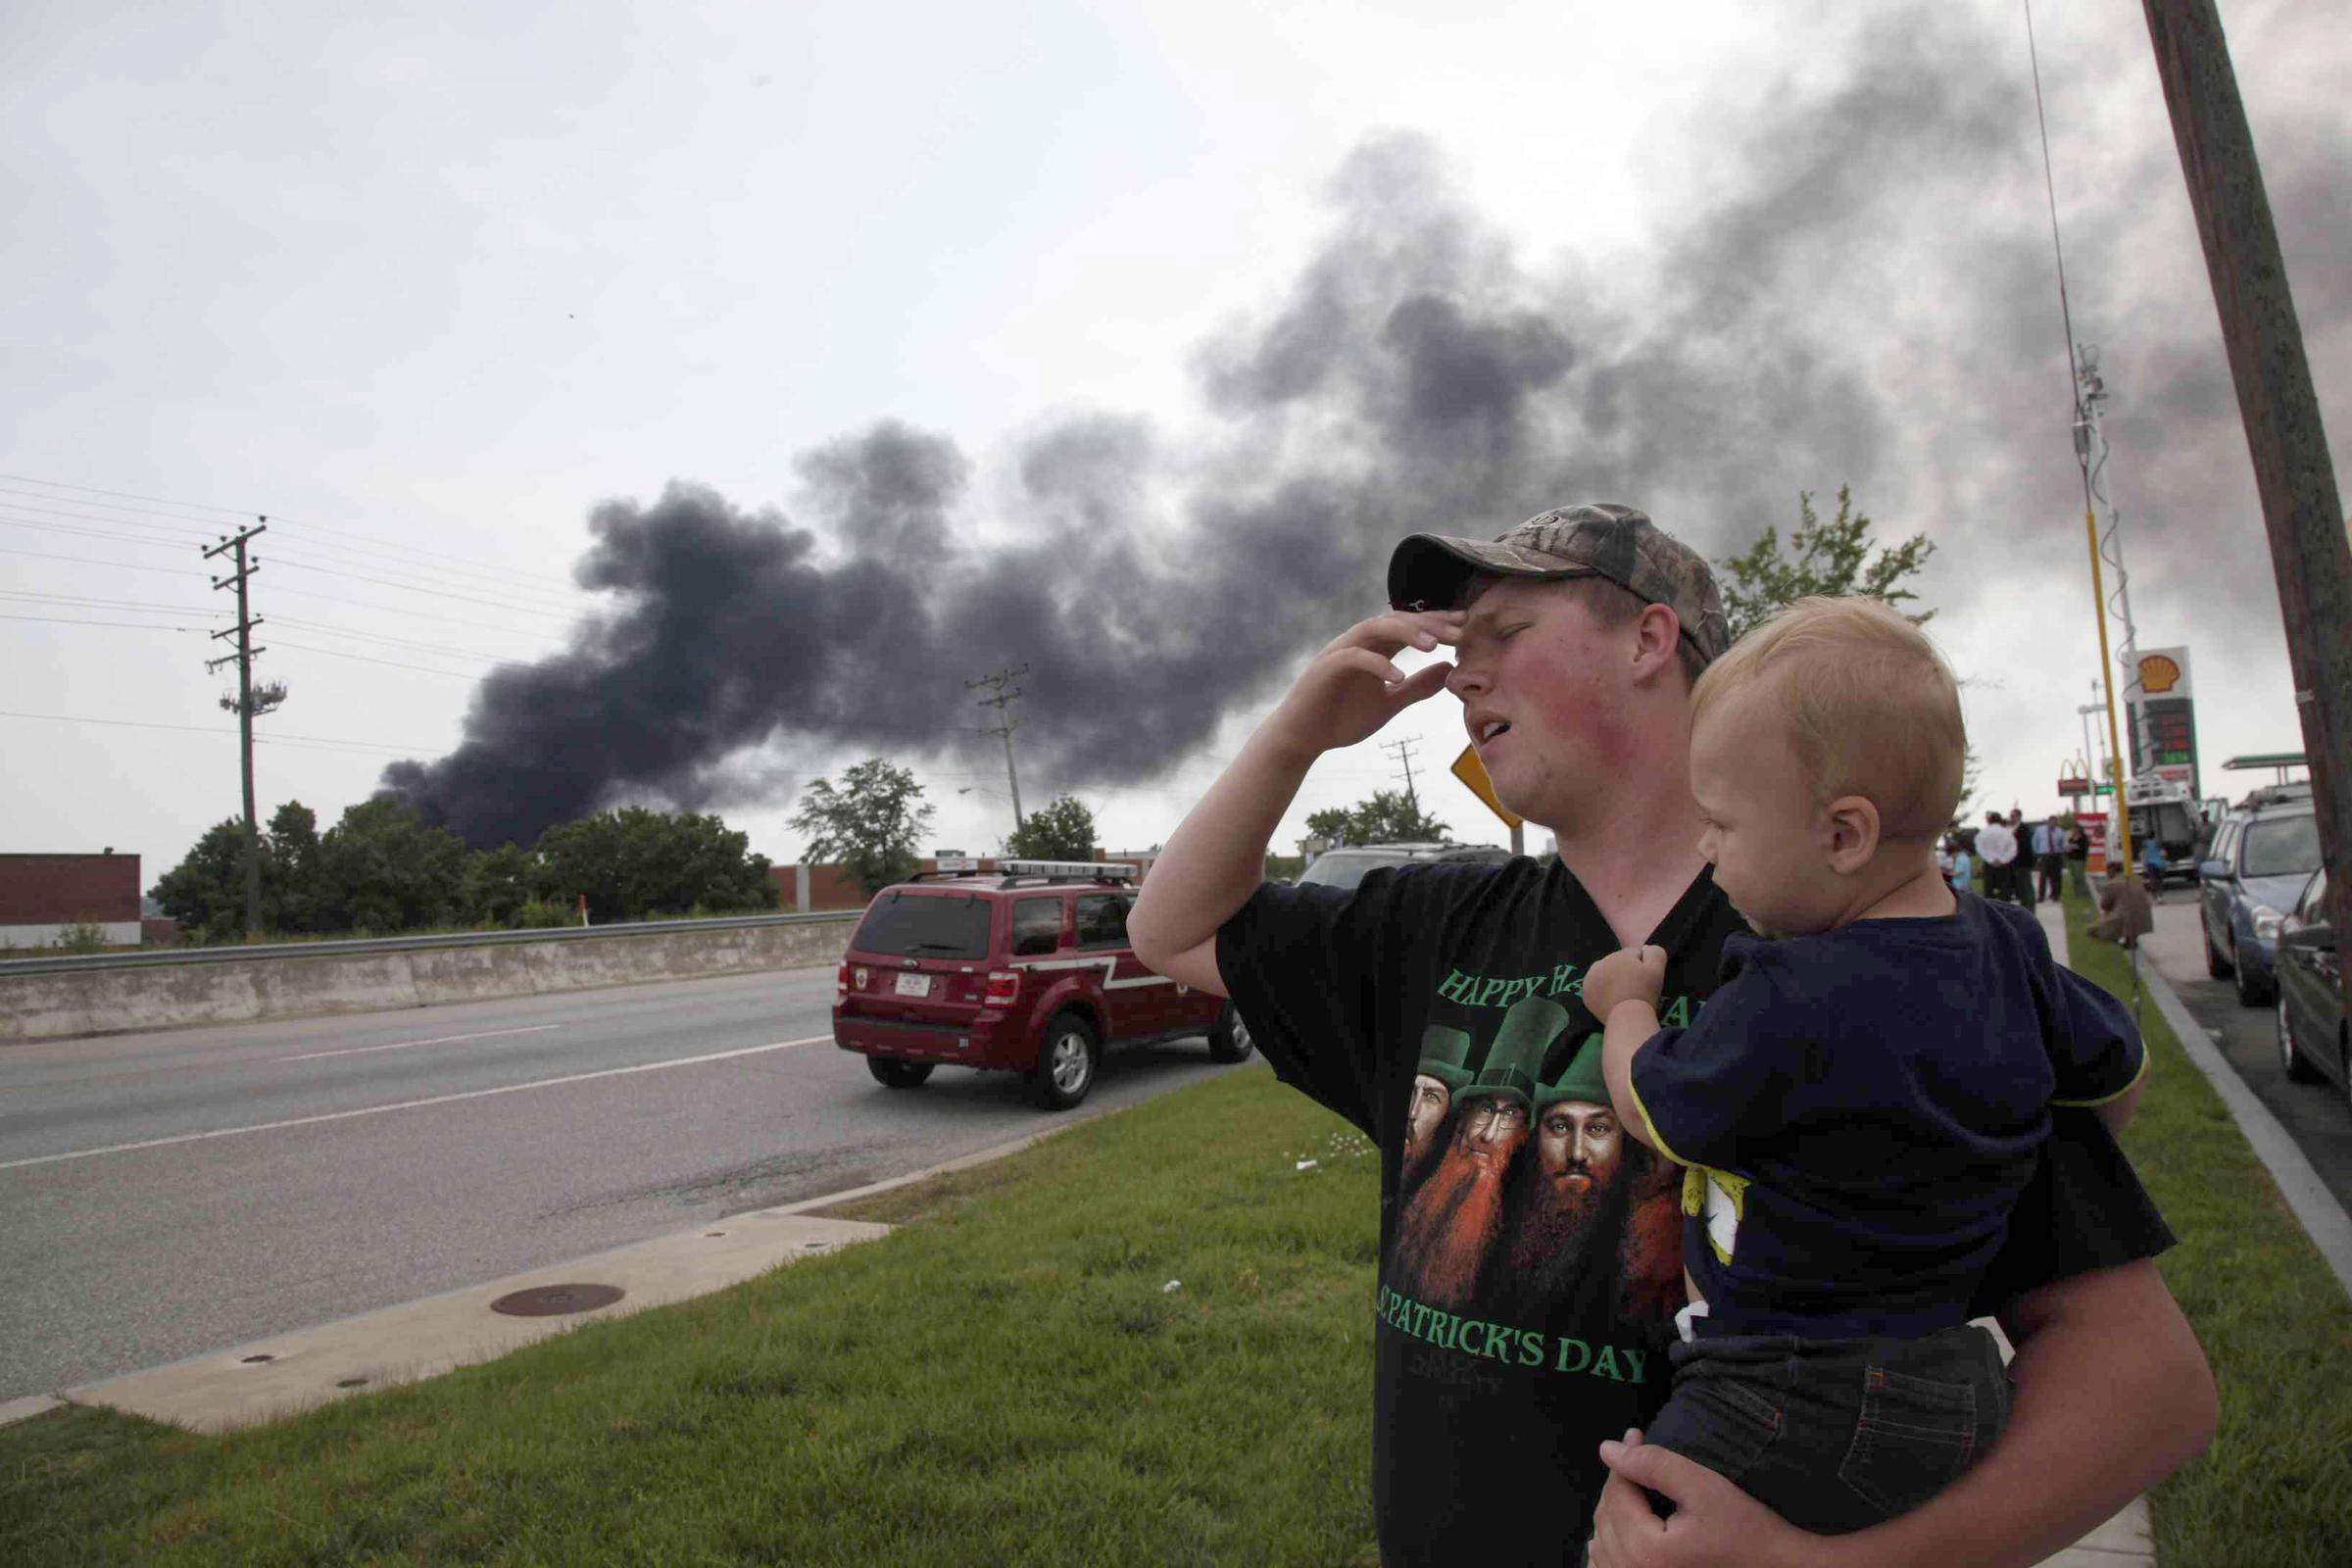 VIDEO: Derailment Near Baltimore Causes Huge Explosion